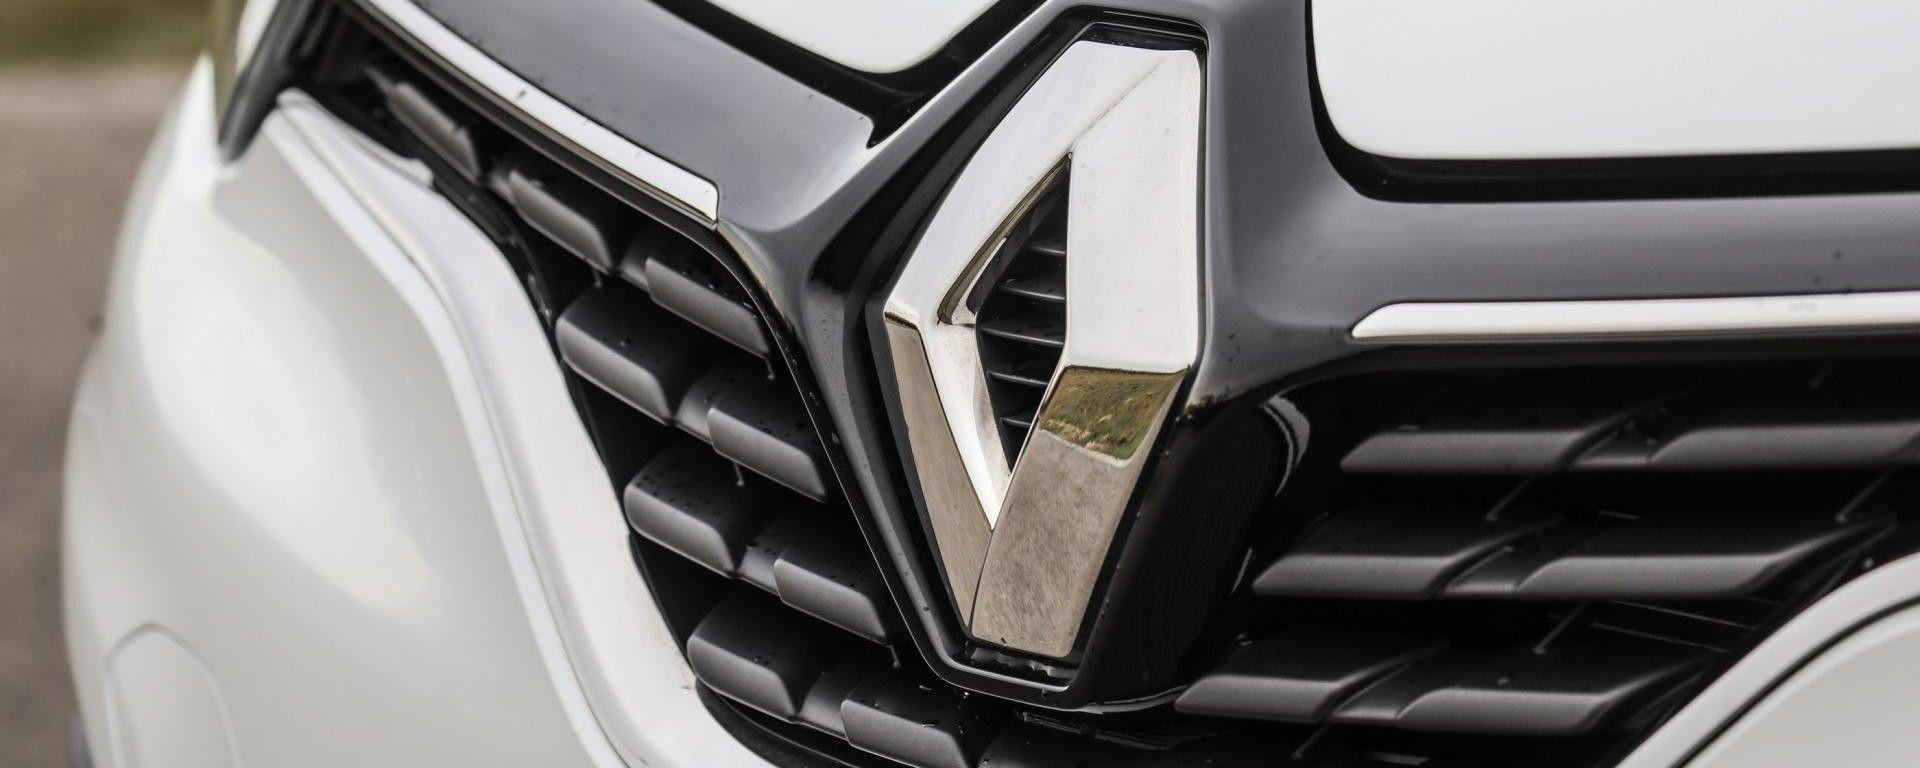 Vetture Renault, garanzia di 3 anni anziché 4